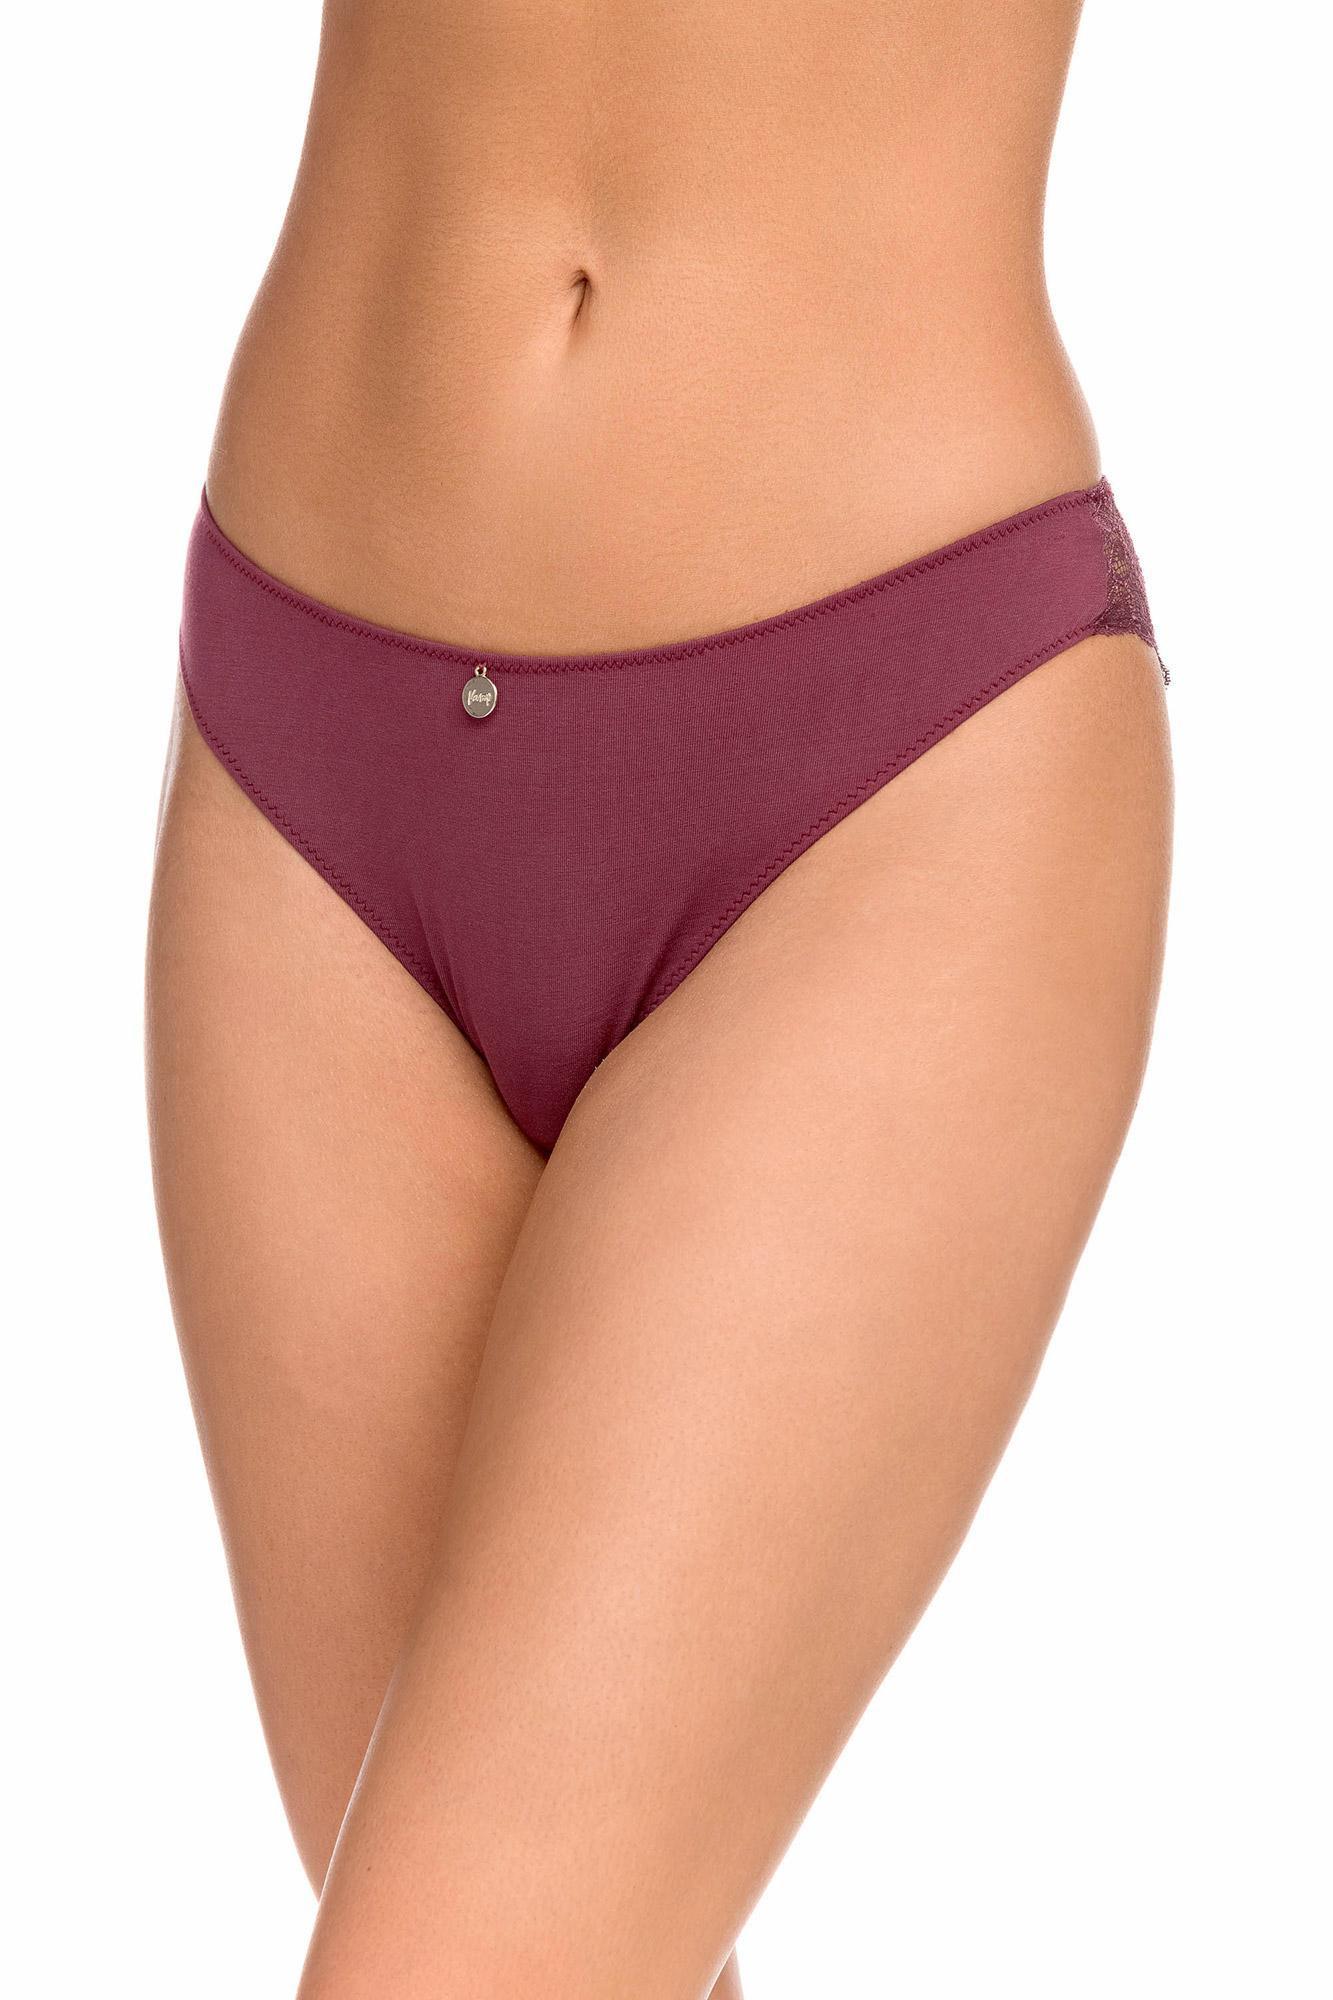 Vamp - Pohodlné jednobarevné dámské kalhotky RED PORTO XL 15829 - Vamp